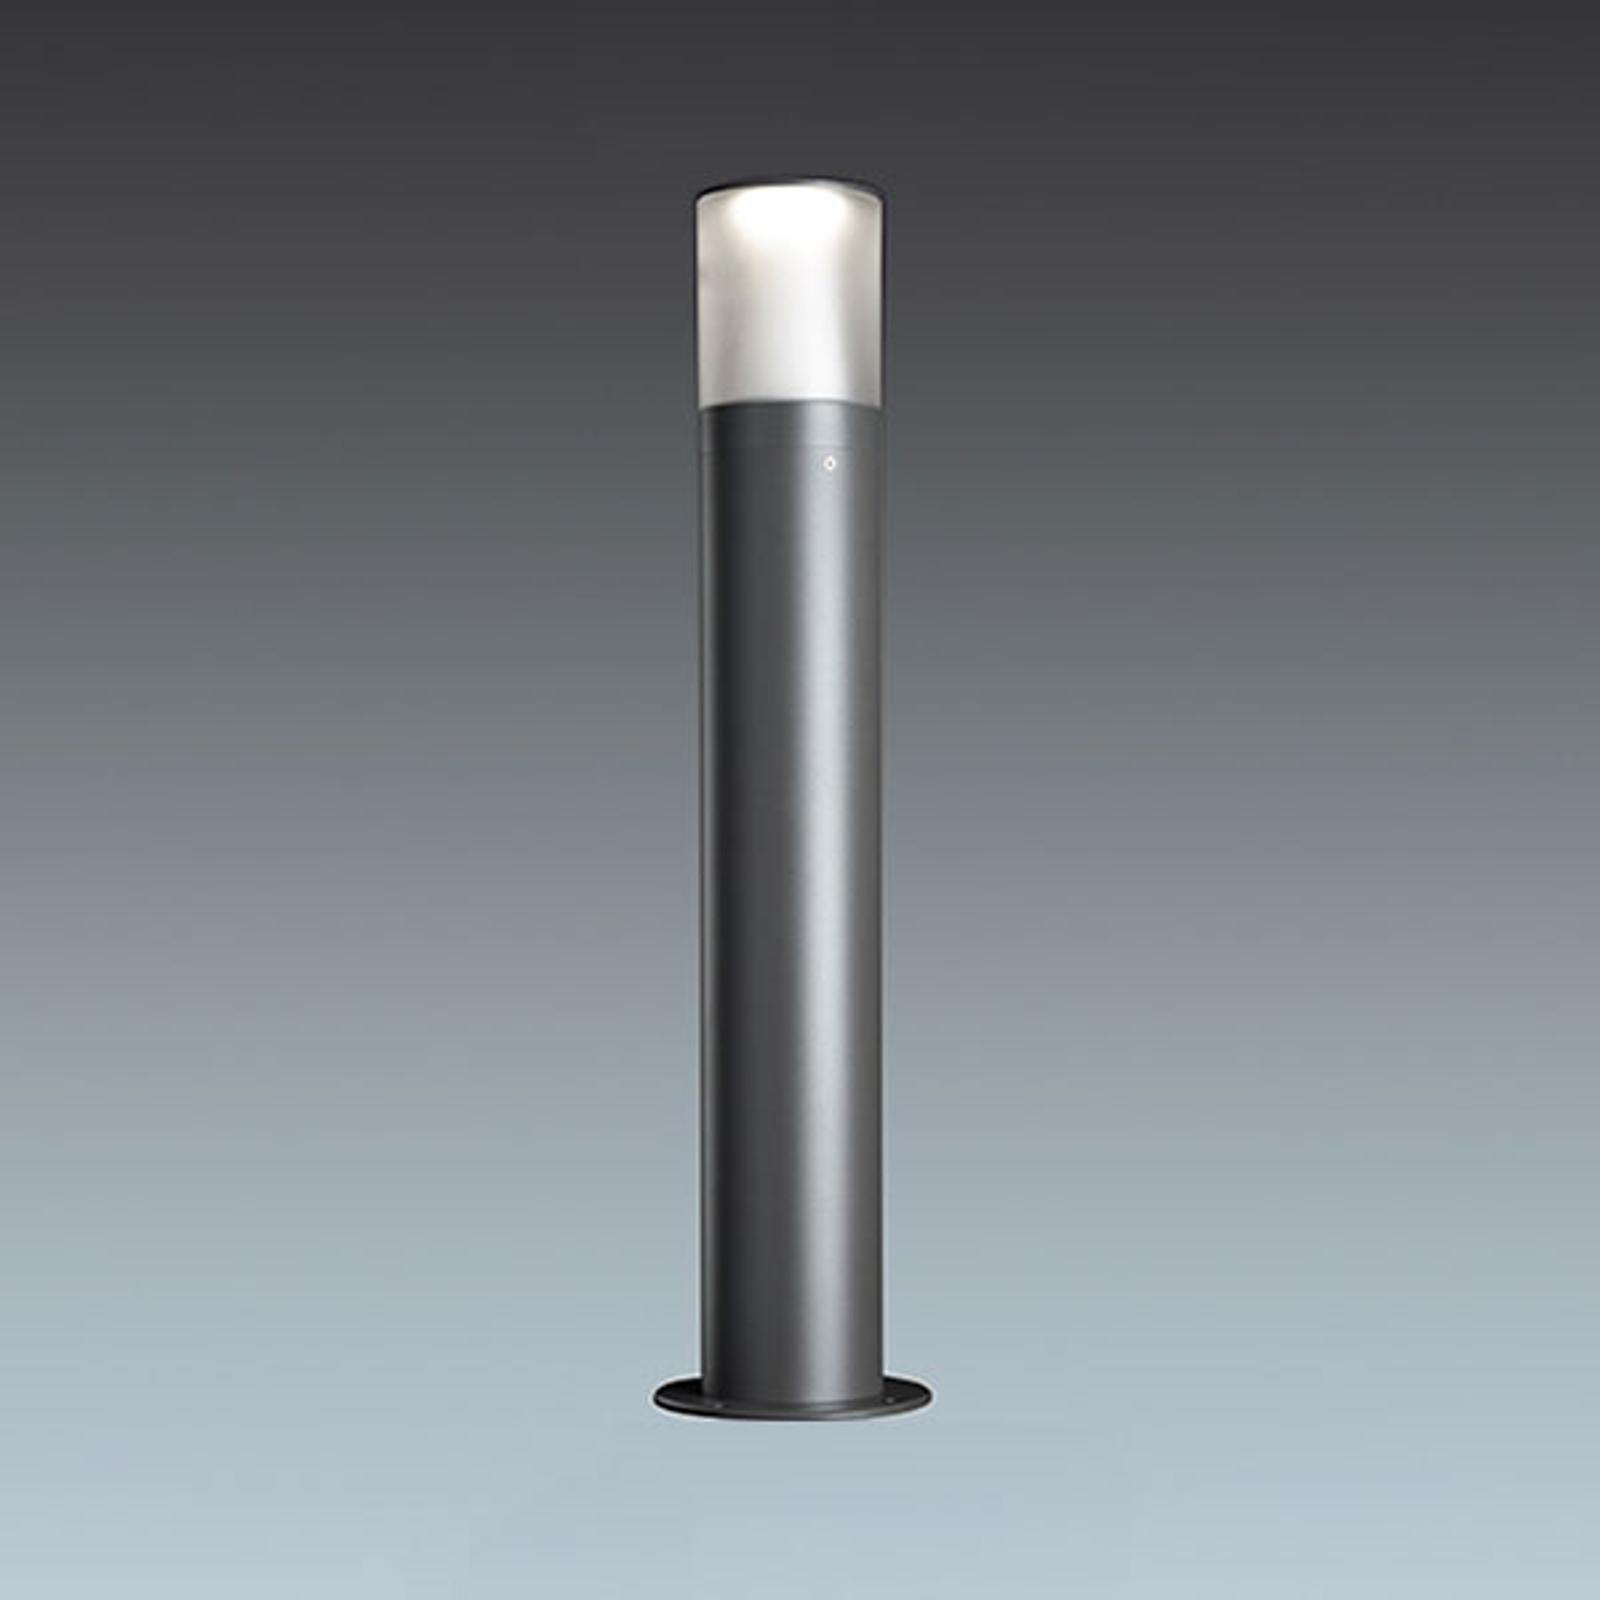 Thorn D-CO LED-Pollerleuchte aus Aluminium, 100cm